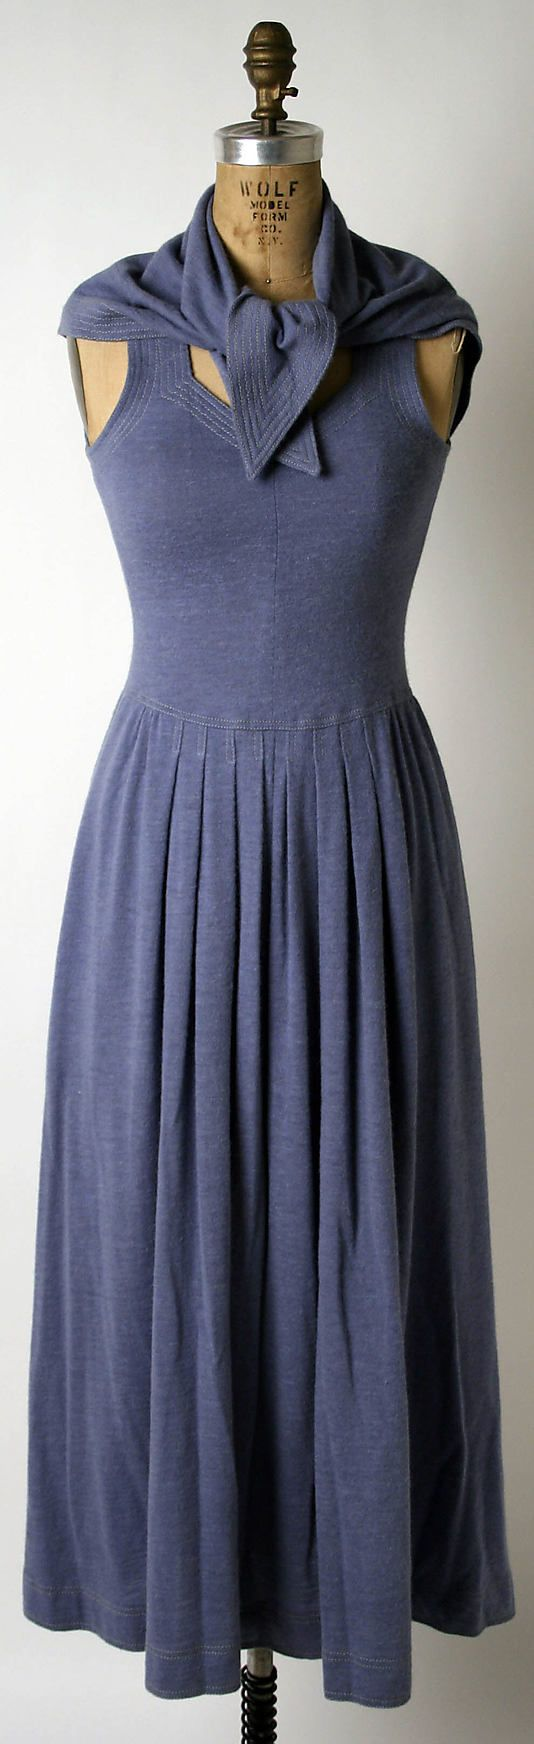 Ensemble  Jean Muir (British, 1928–1995)  Date: spring/summer 1974 Culture: British Medium: wool